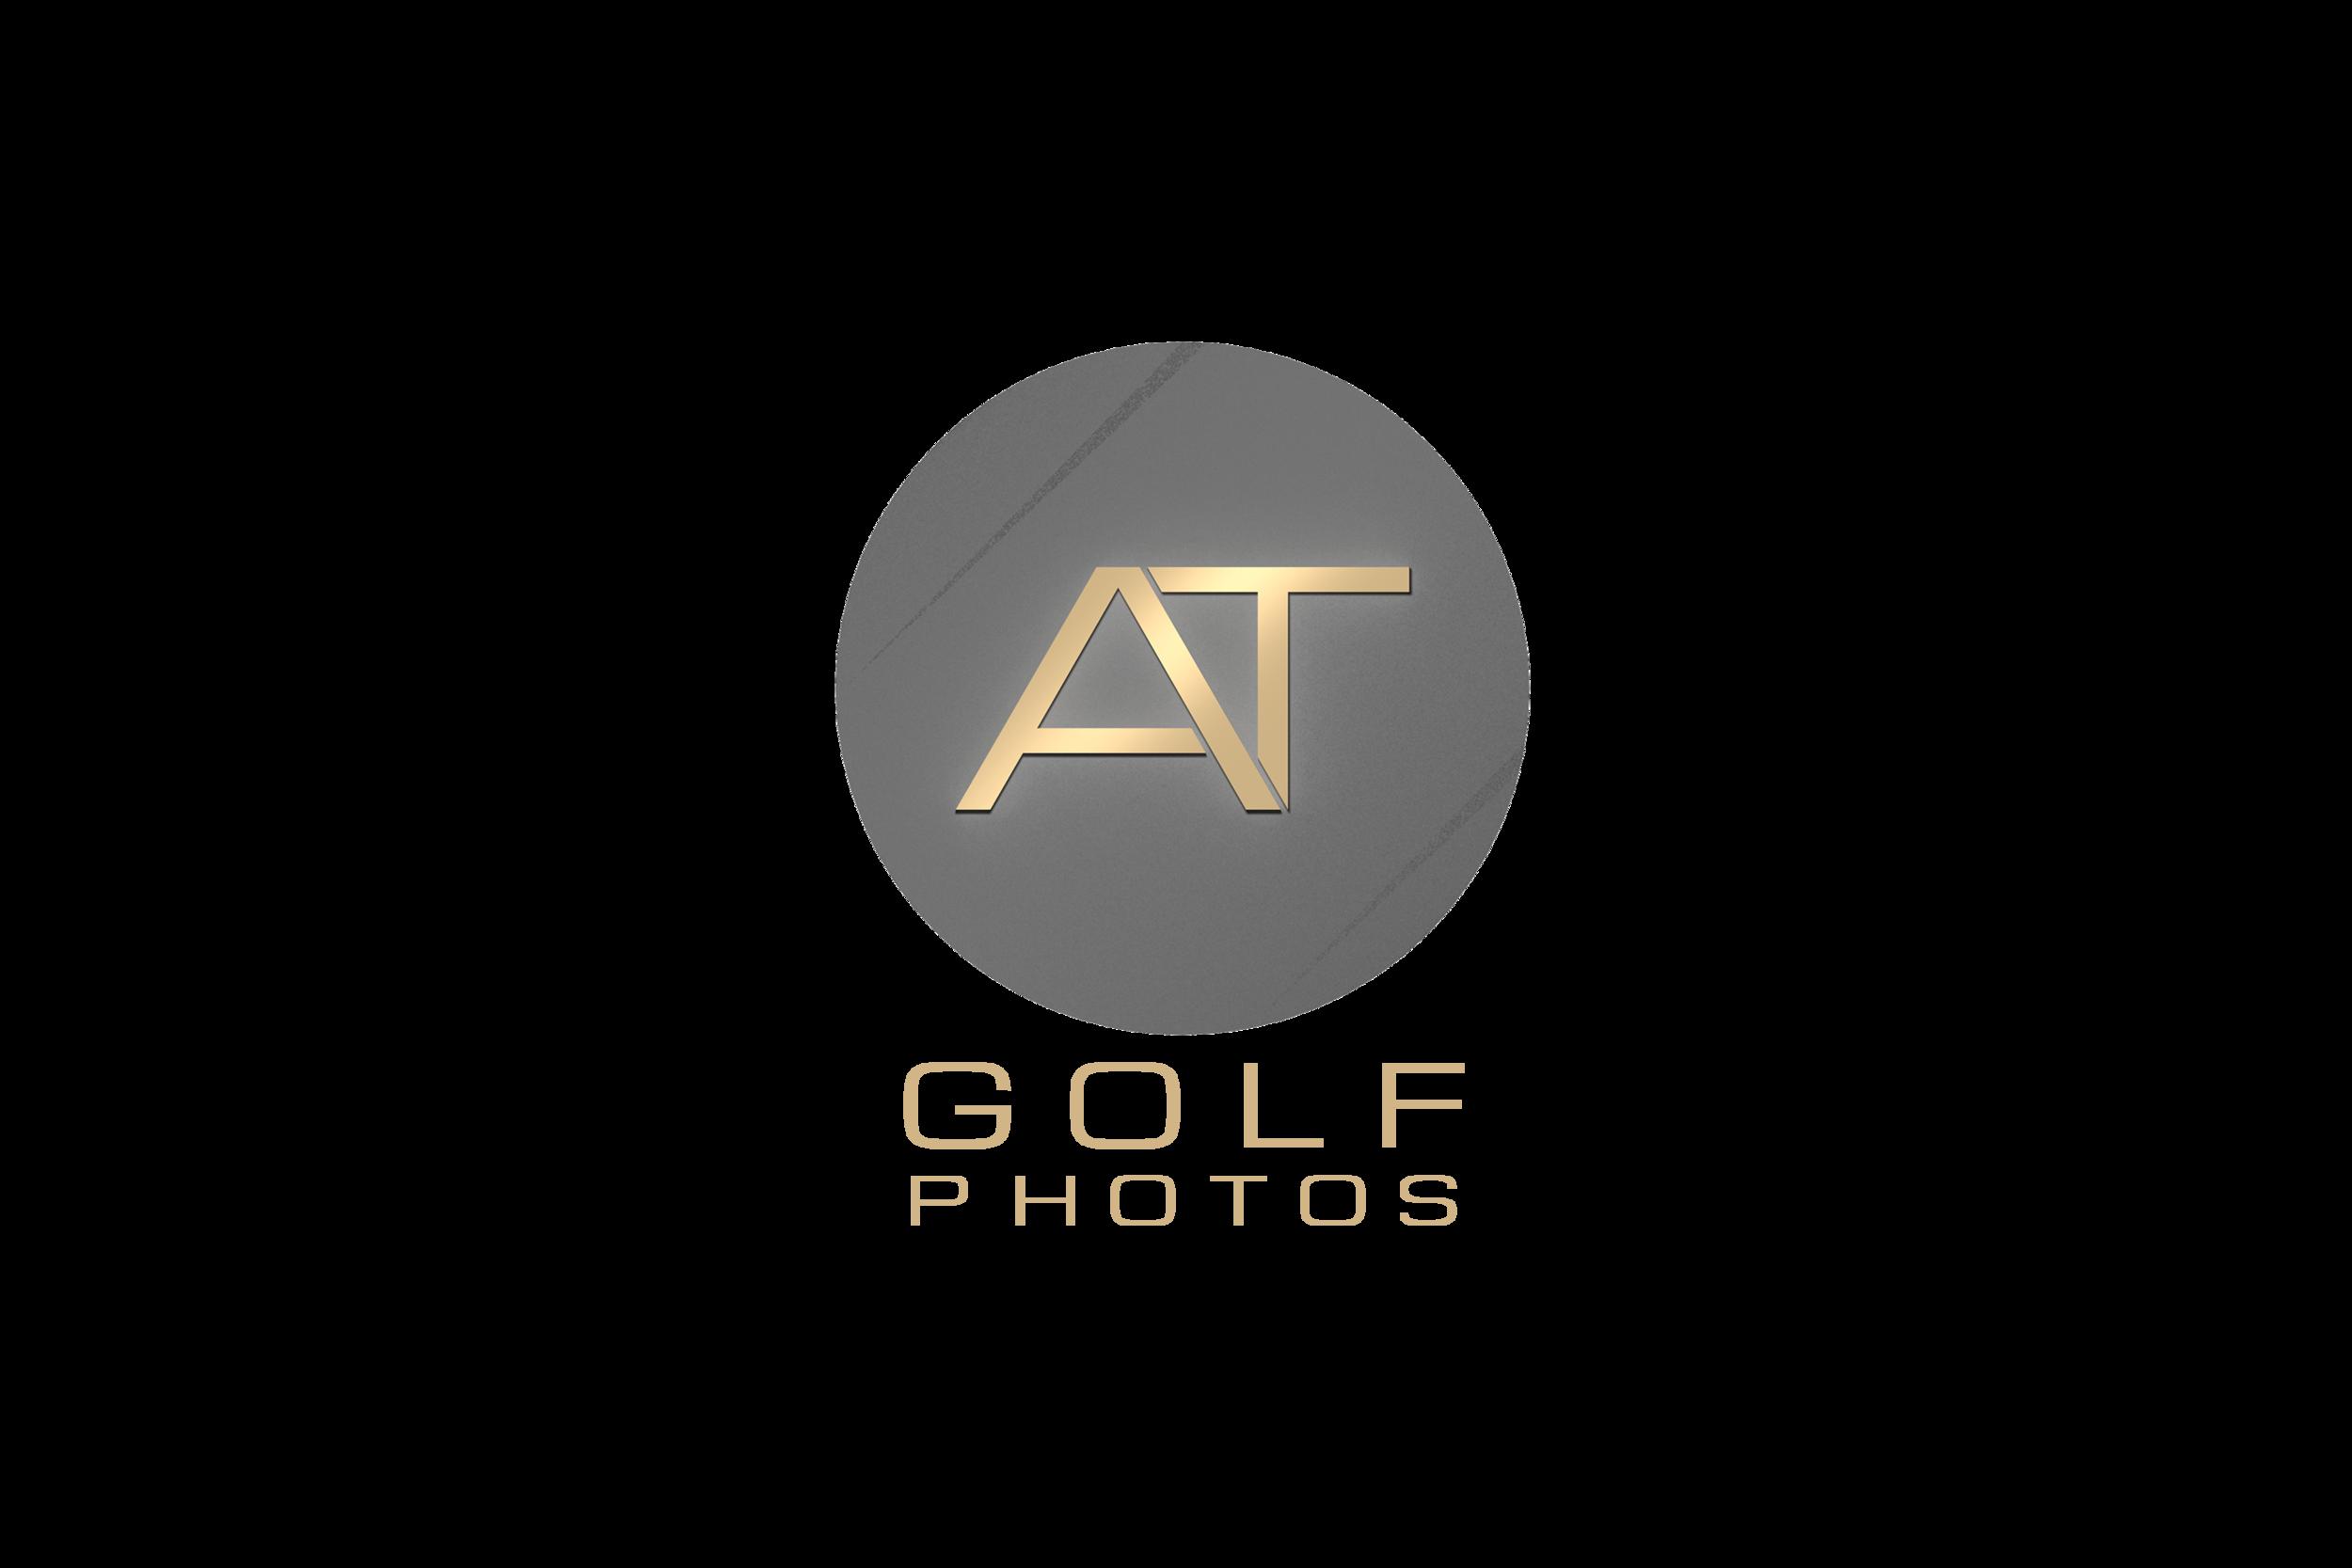 Aniko Towers Golf Photos logo square.png